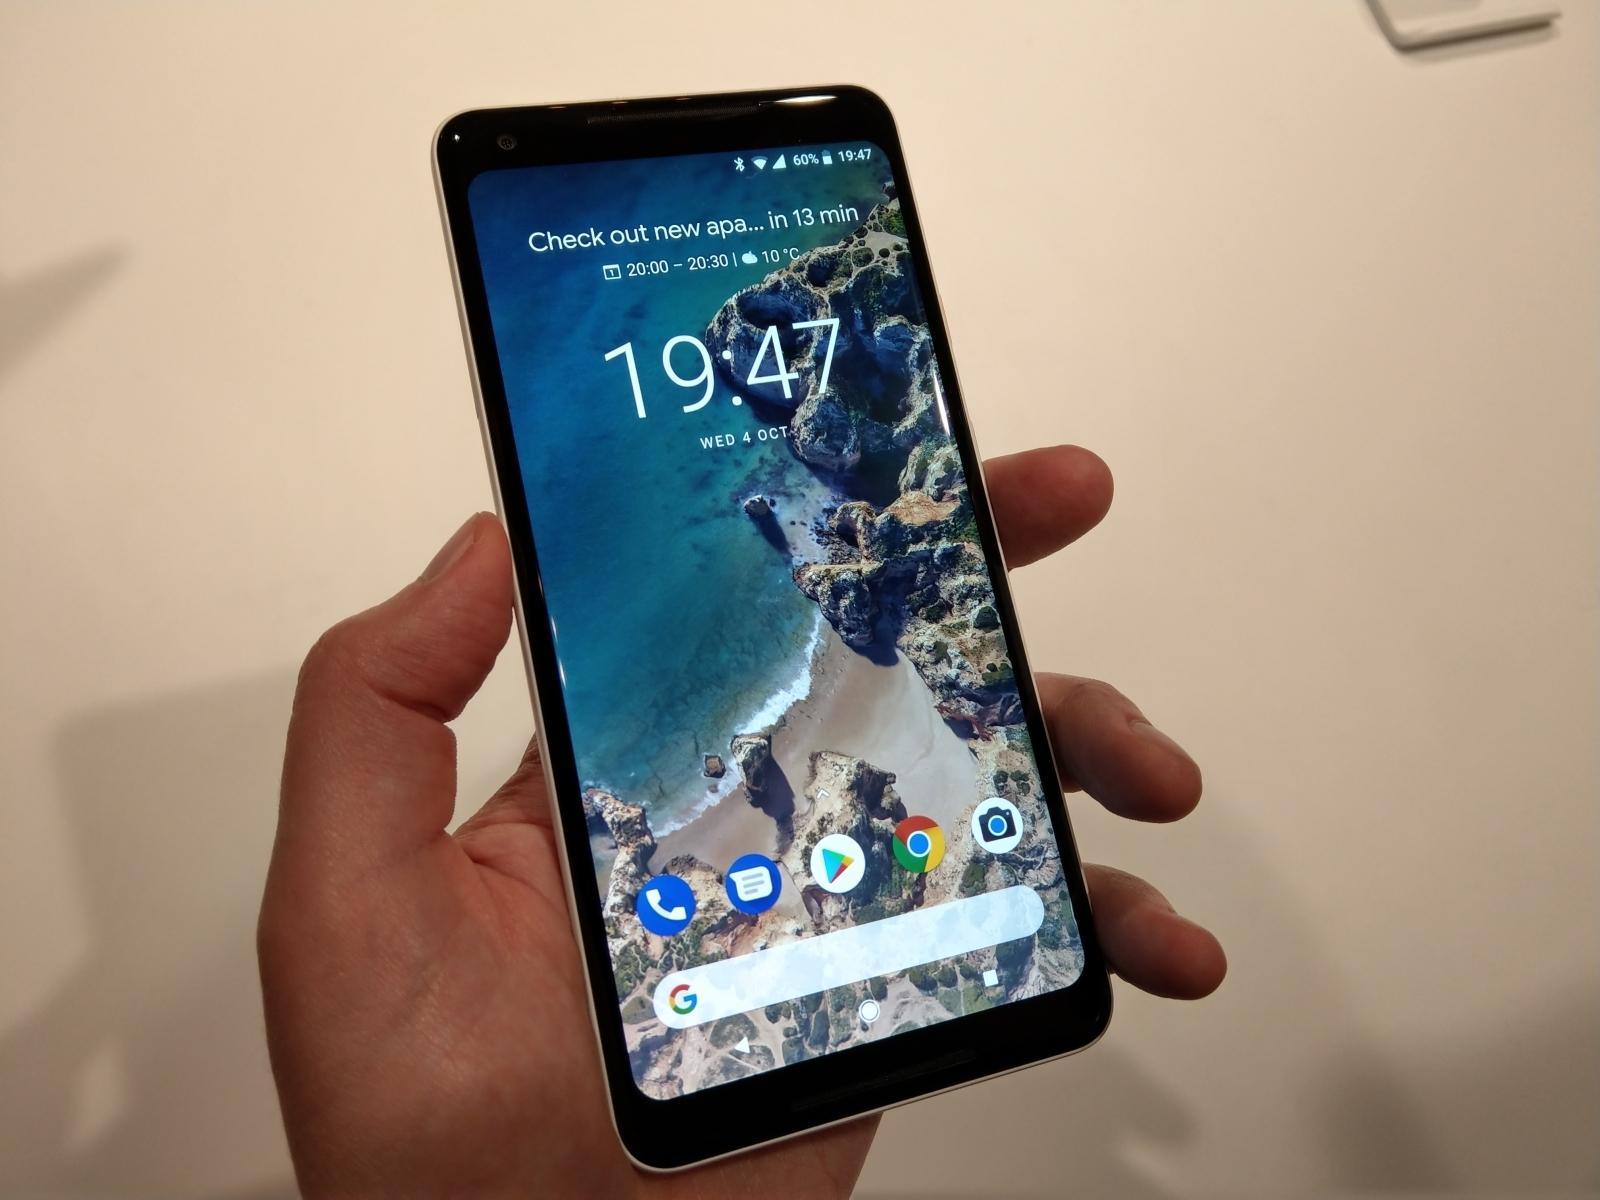 Google Pixel 2 XL Hands On